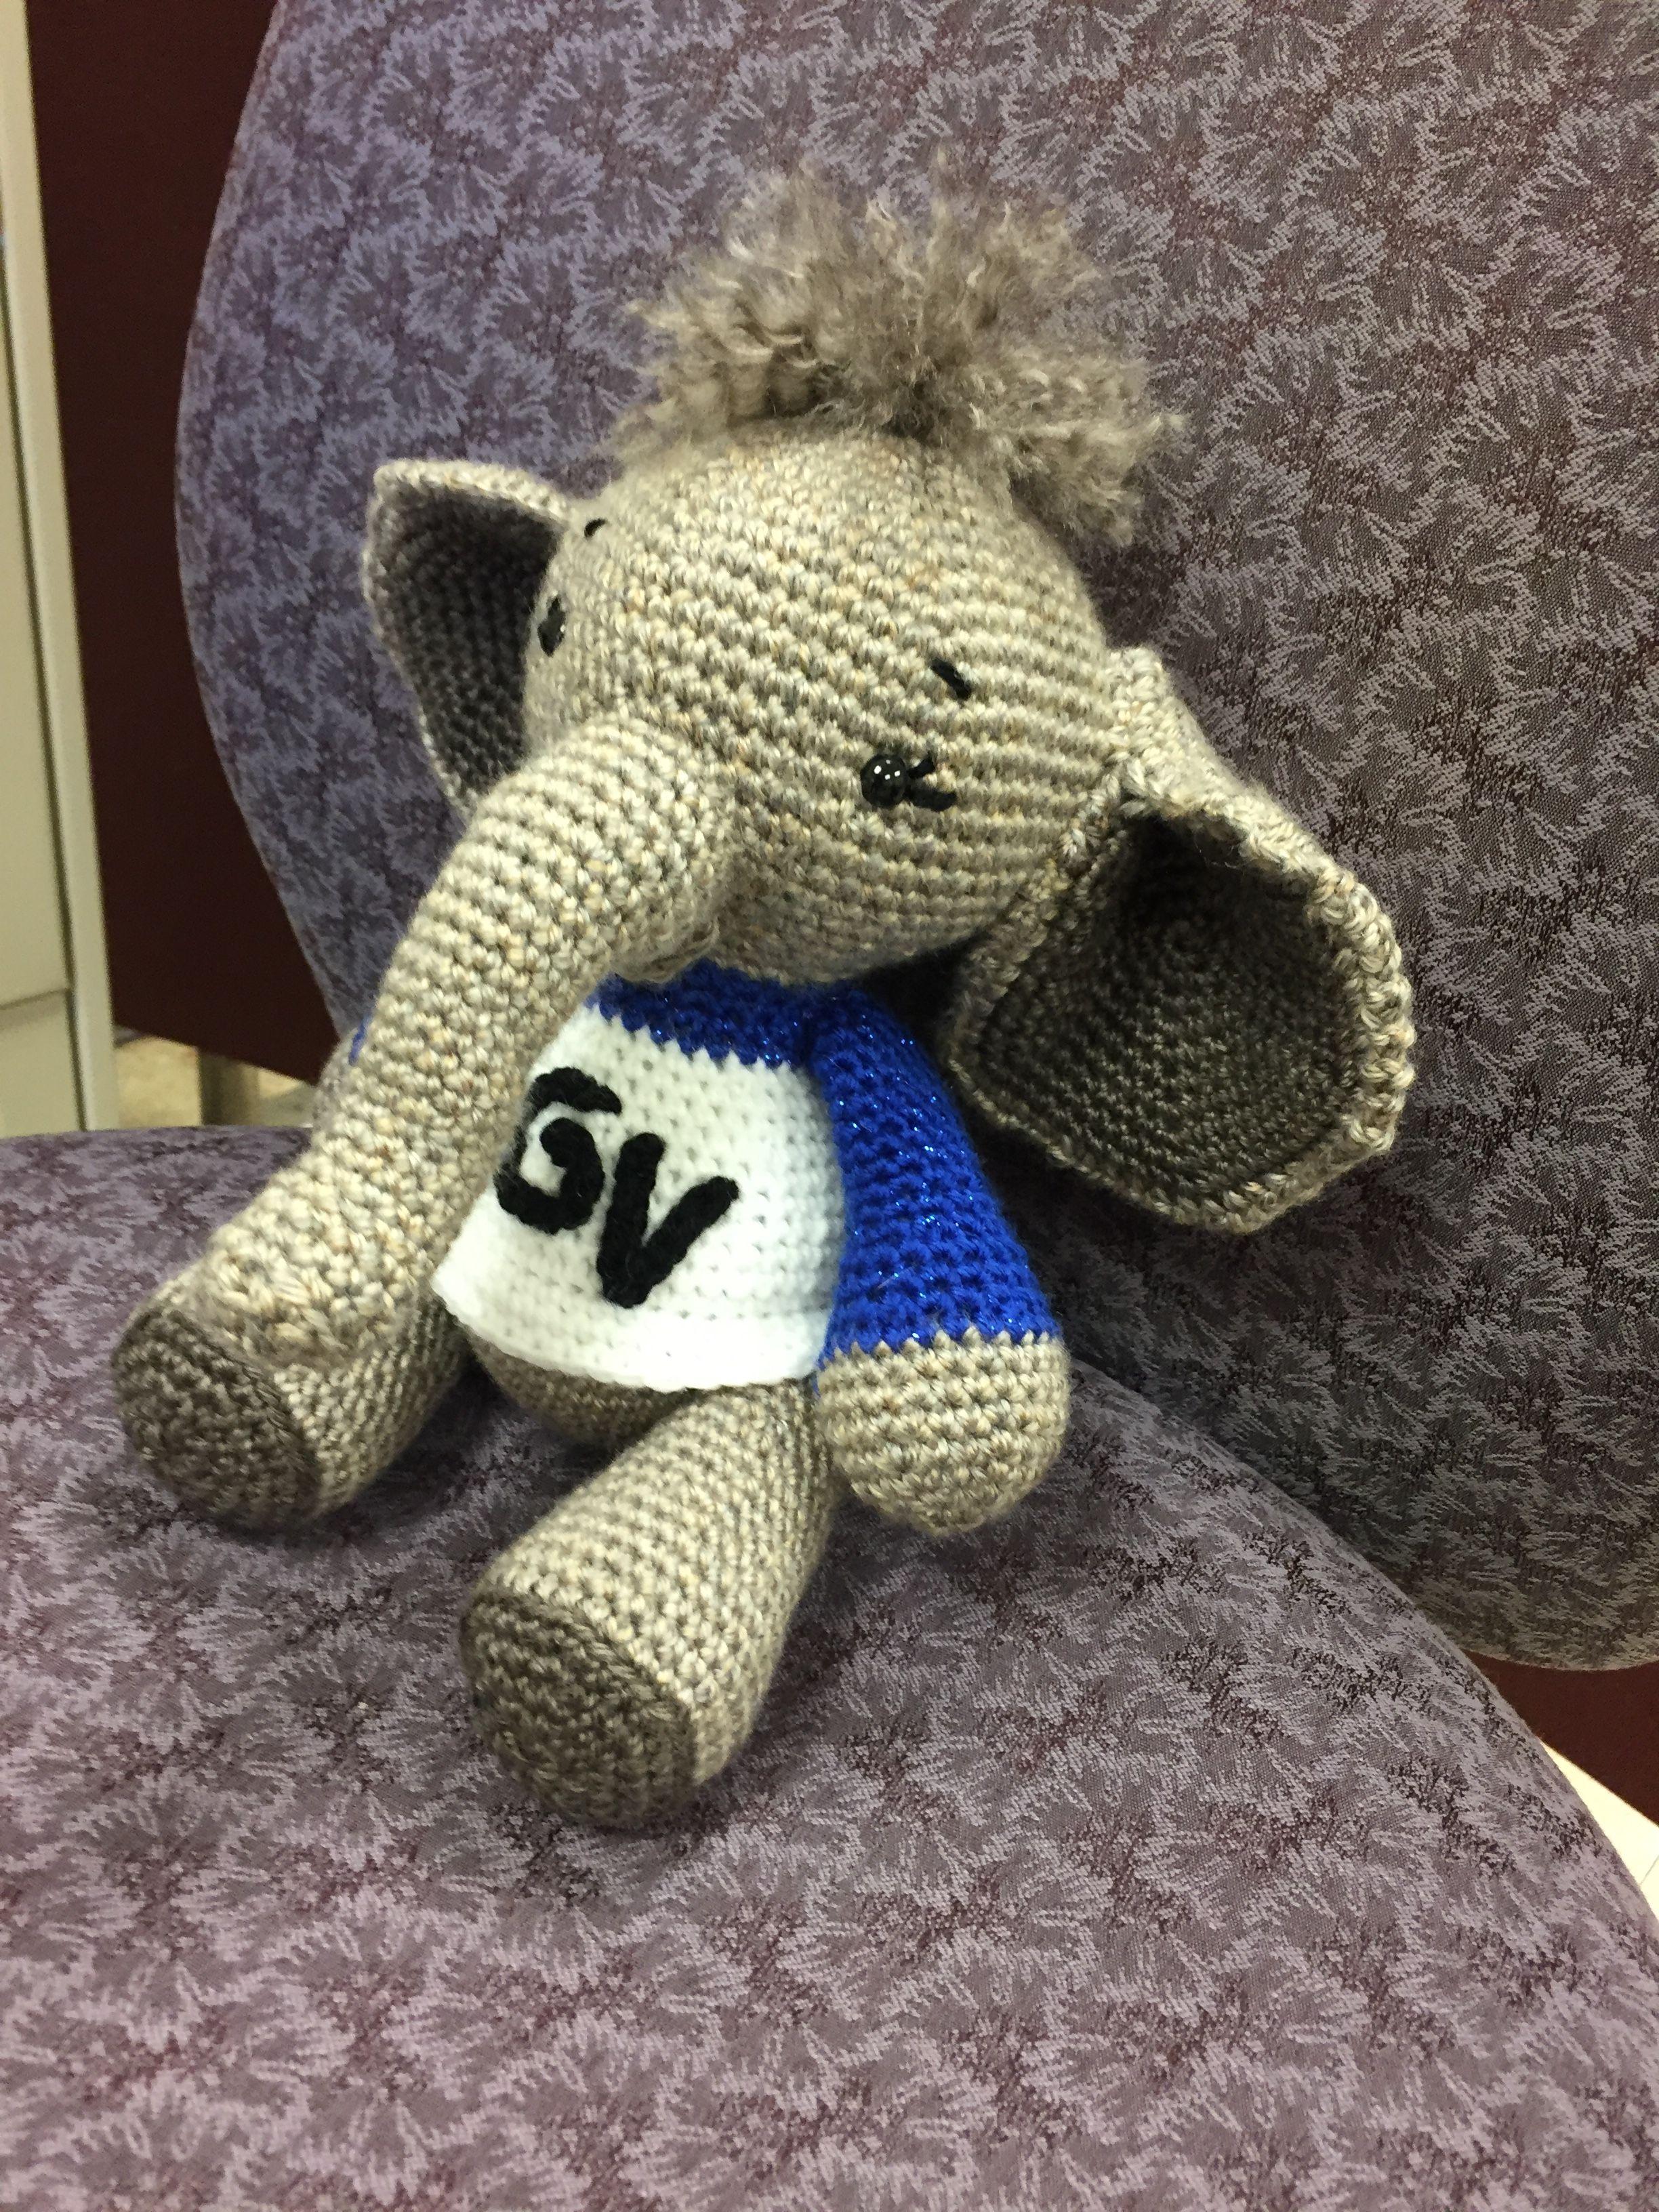 Grand Valley tee shirt crocheted crochet plushy toy plush amigurumi ...